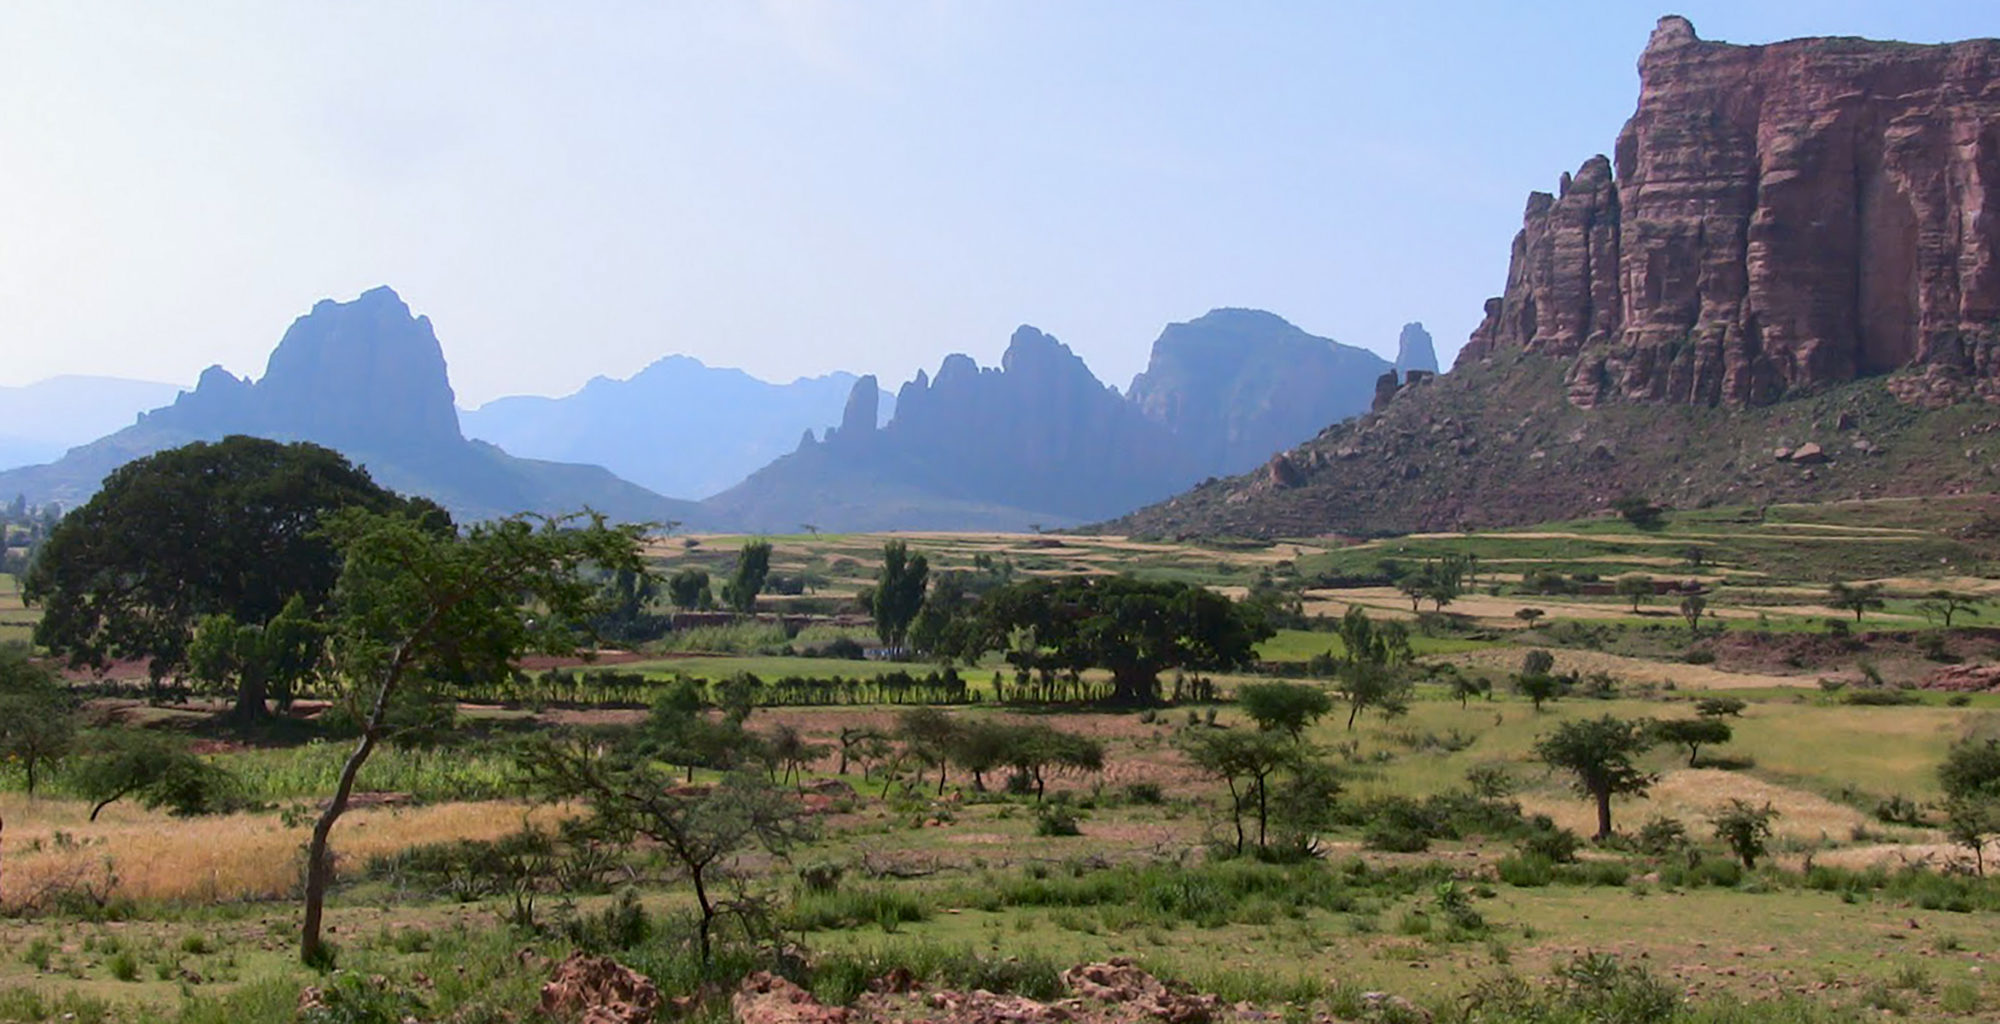 Ethiopia-Gheralta-Mekele-Valley